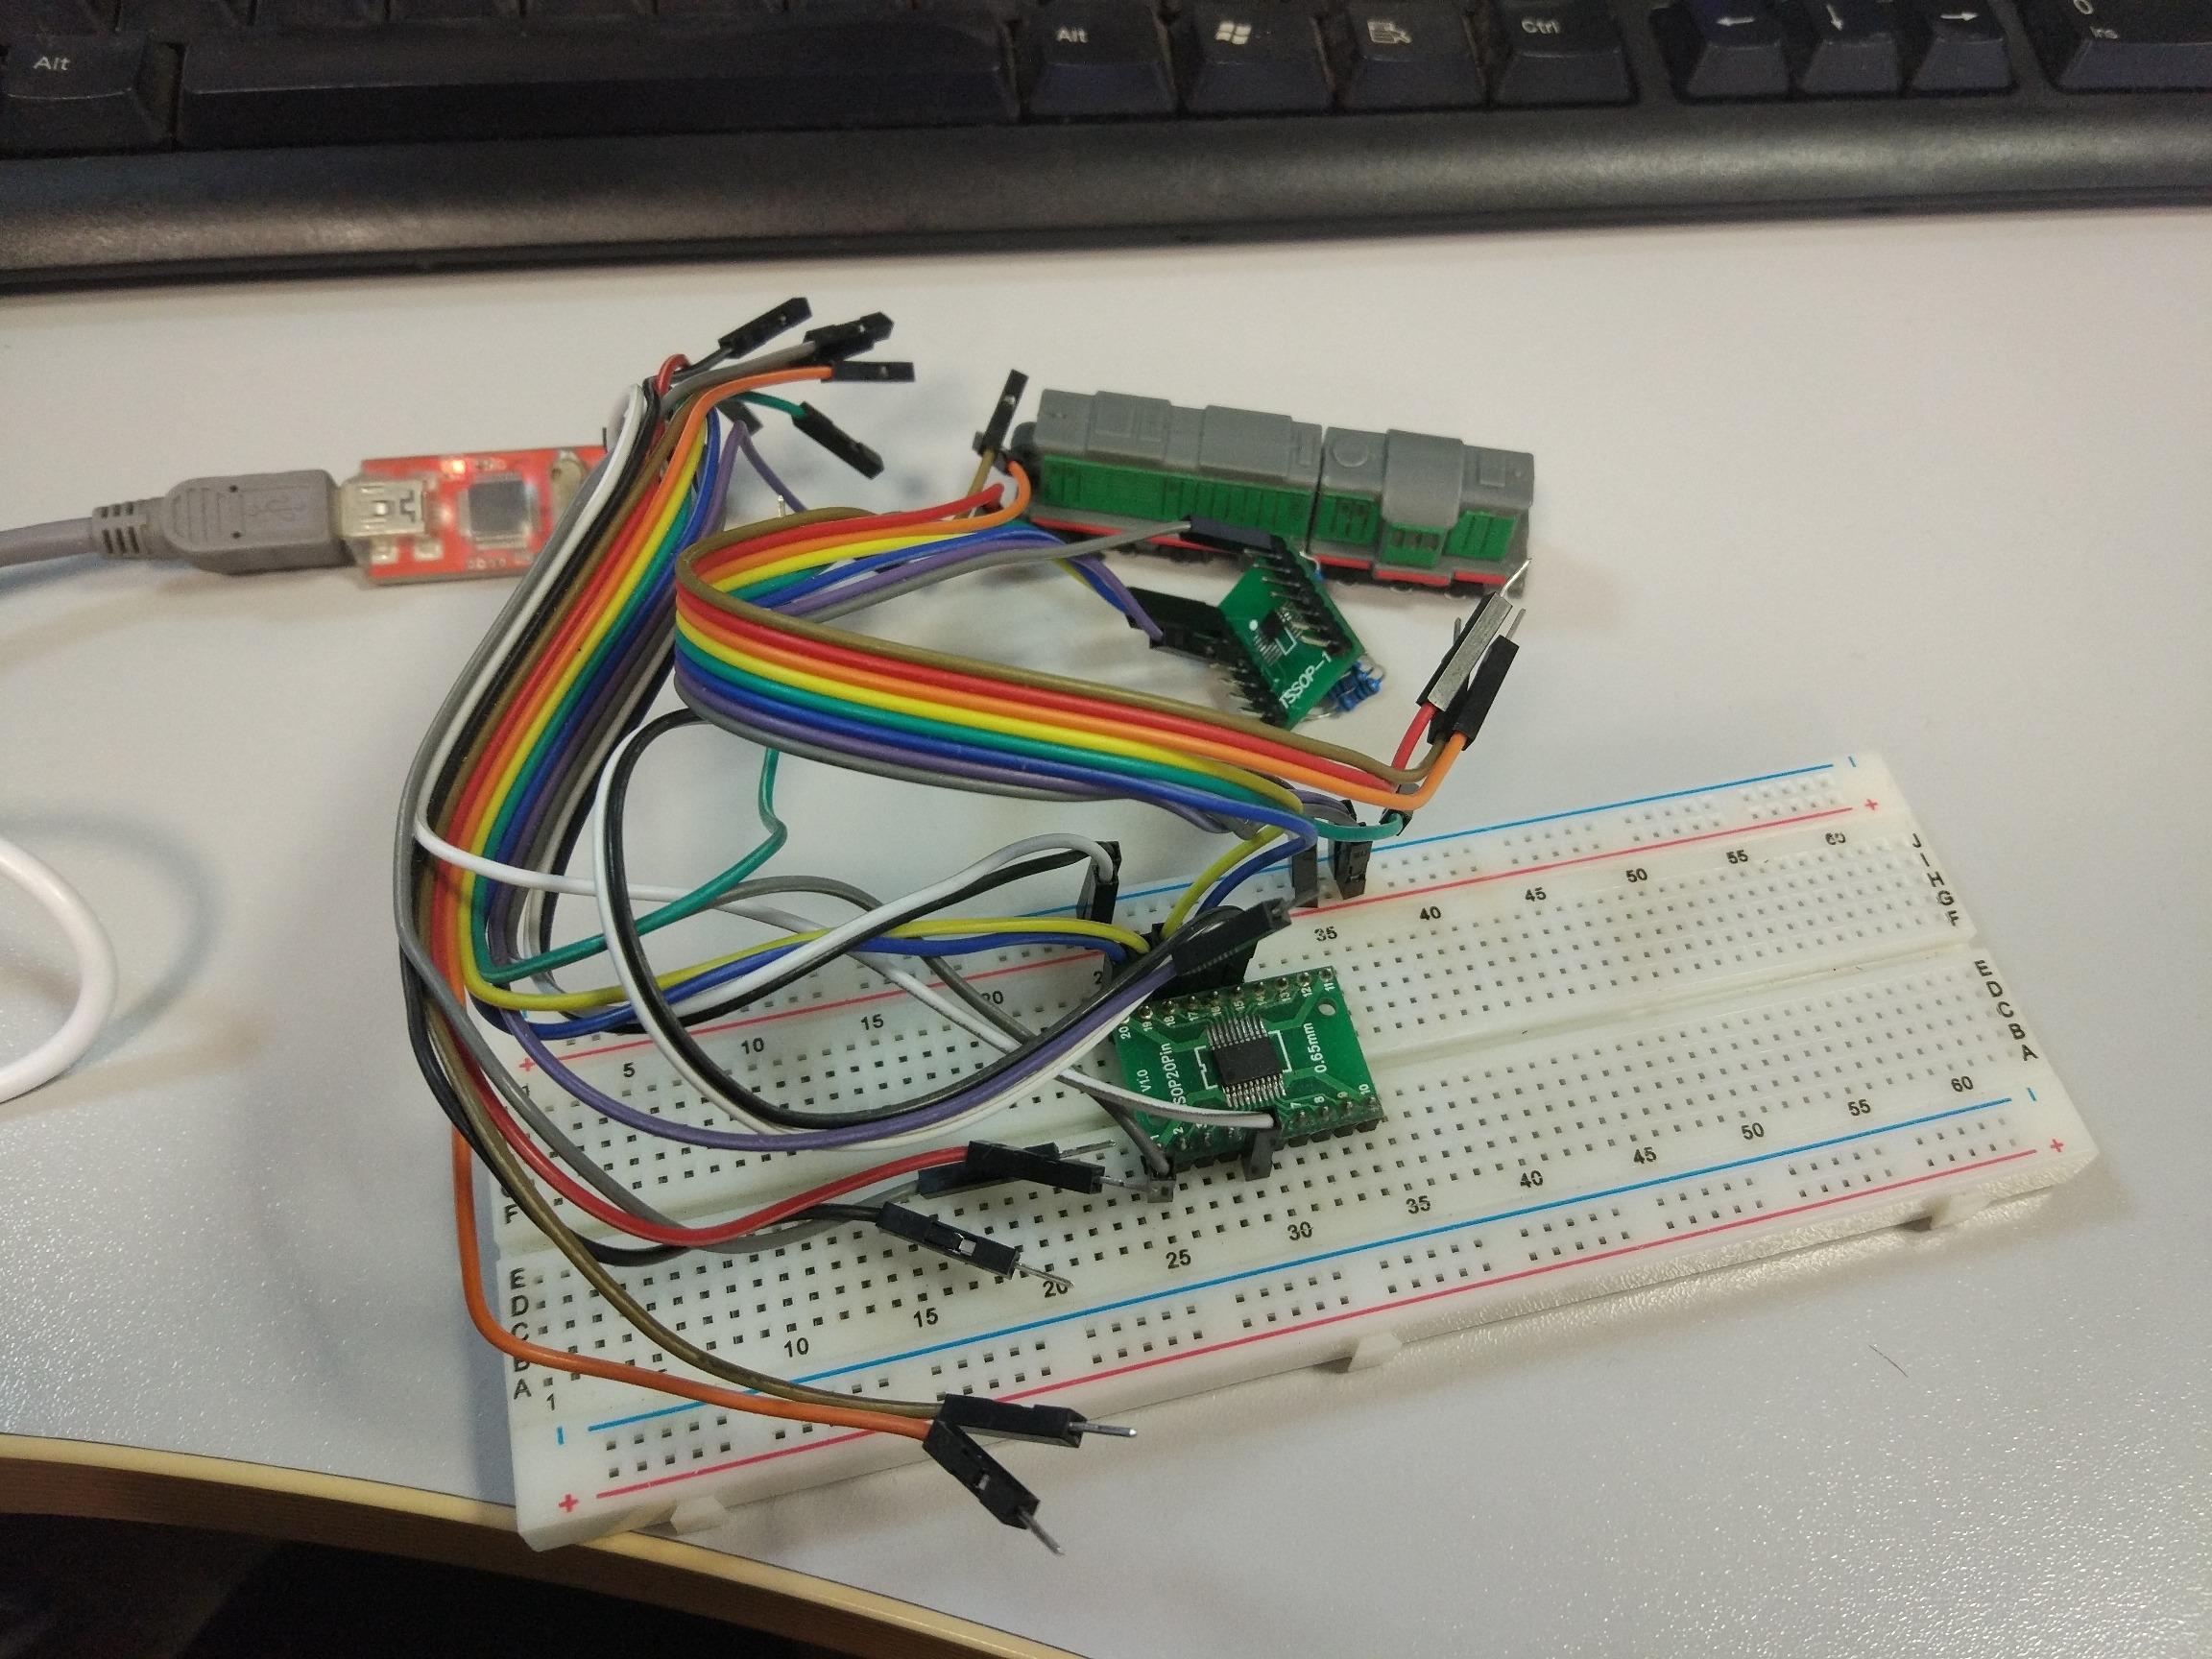 STM32|Подключаем датчик температуры STLM75 по шине I2C